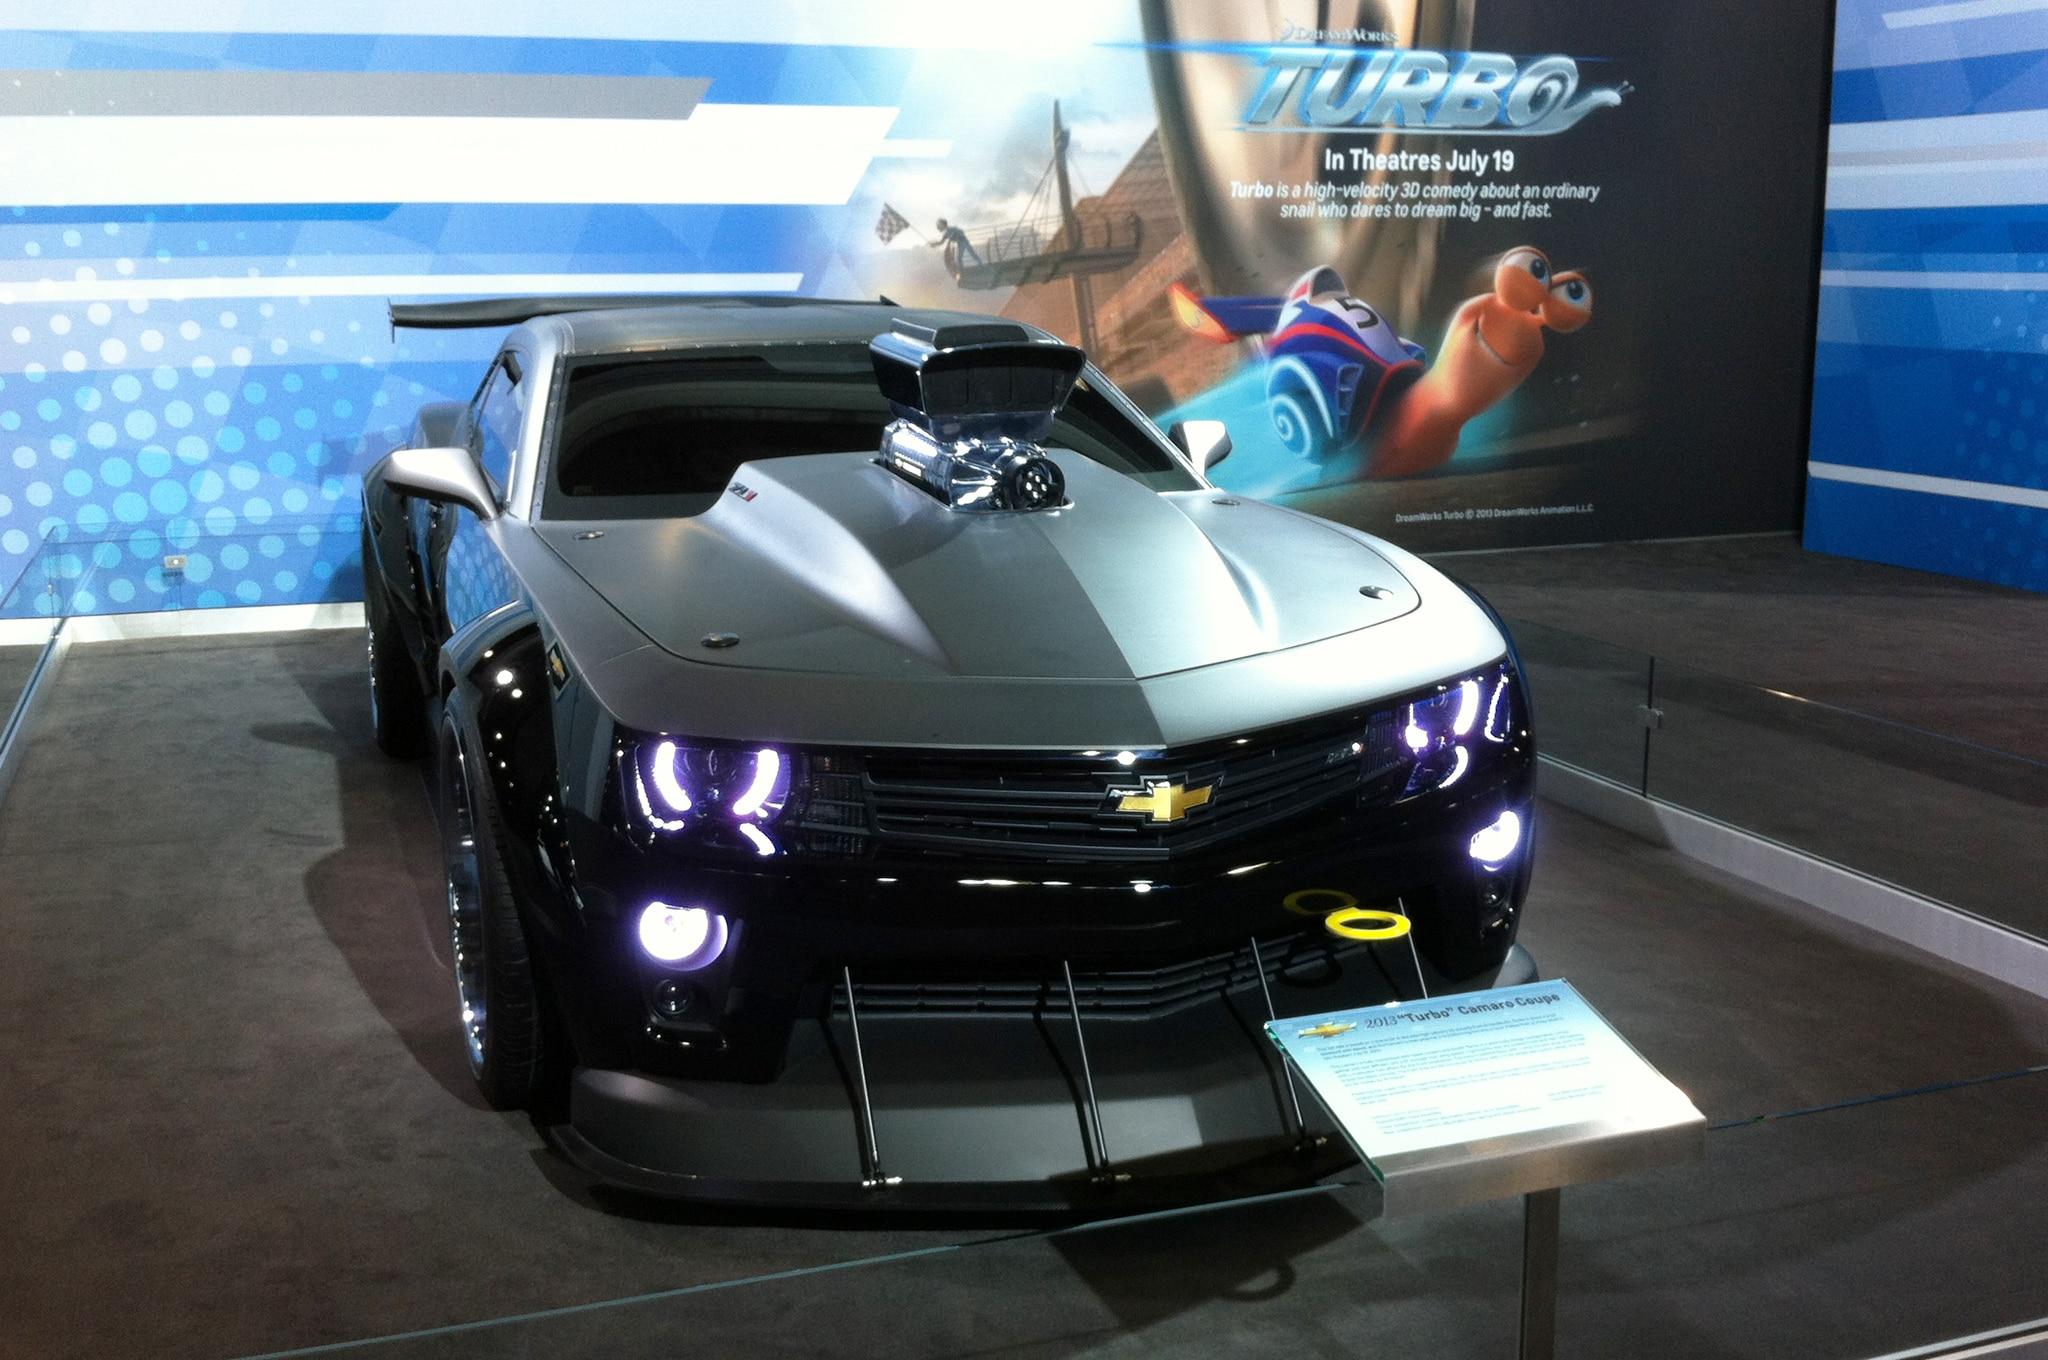 Chevrolet Camaro Turbo Movie Car Front View1